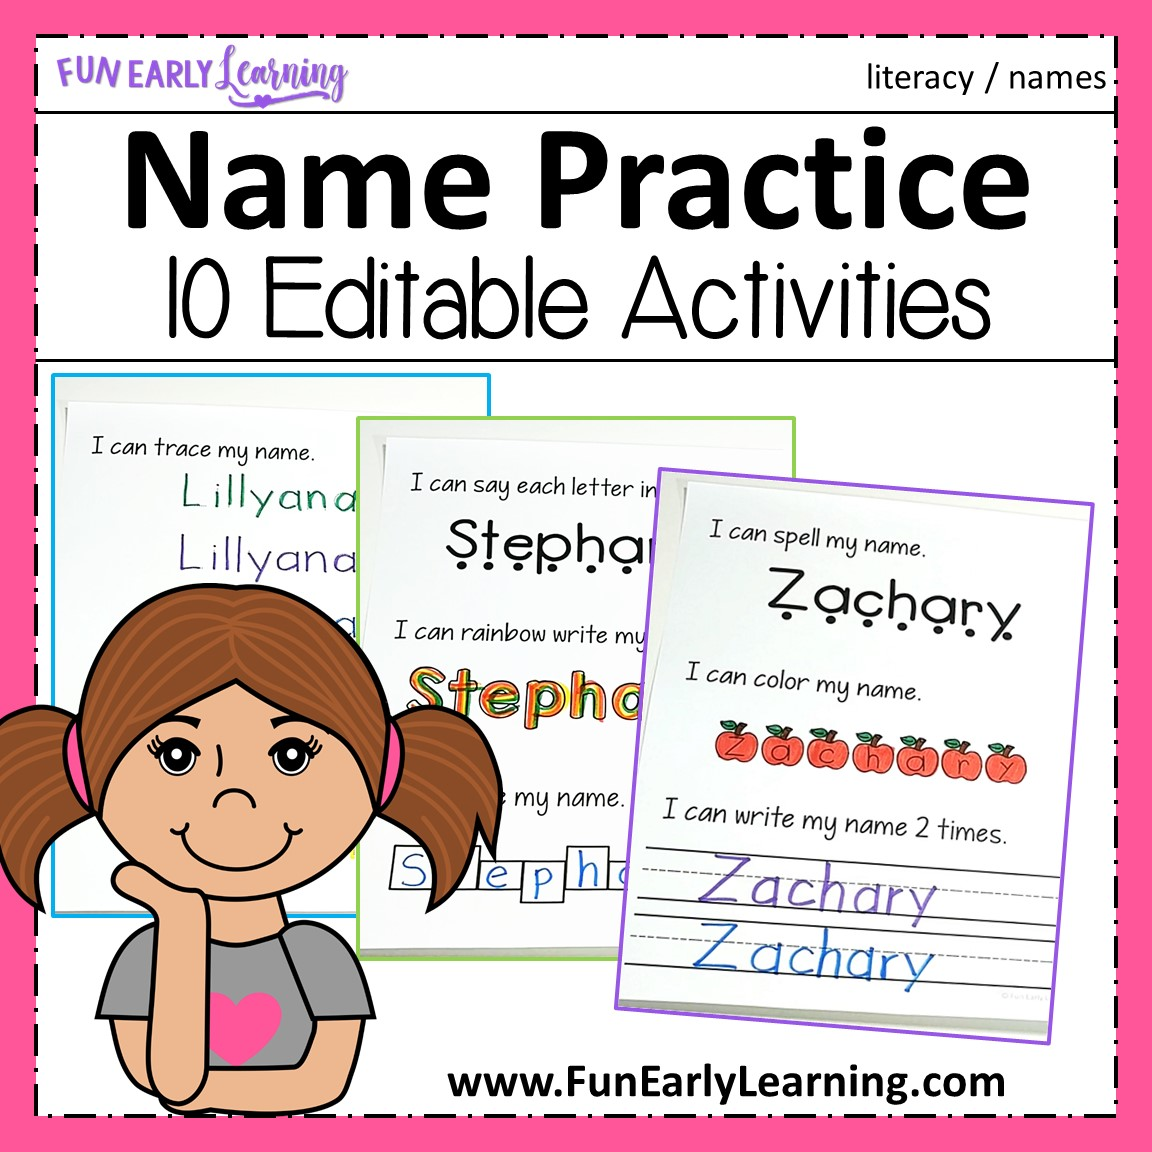 Editable Name Practice Activities For Preschool And